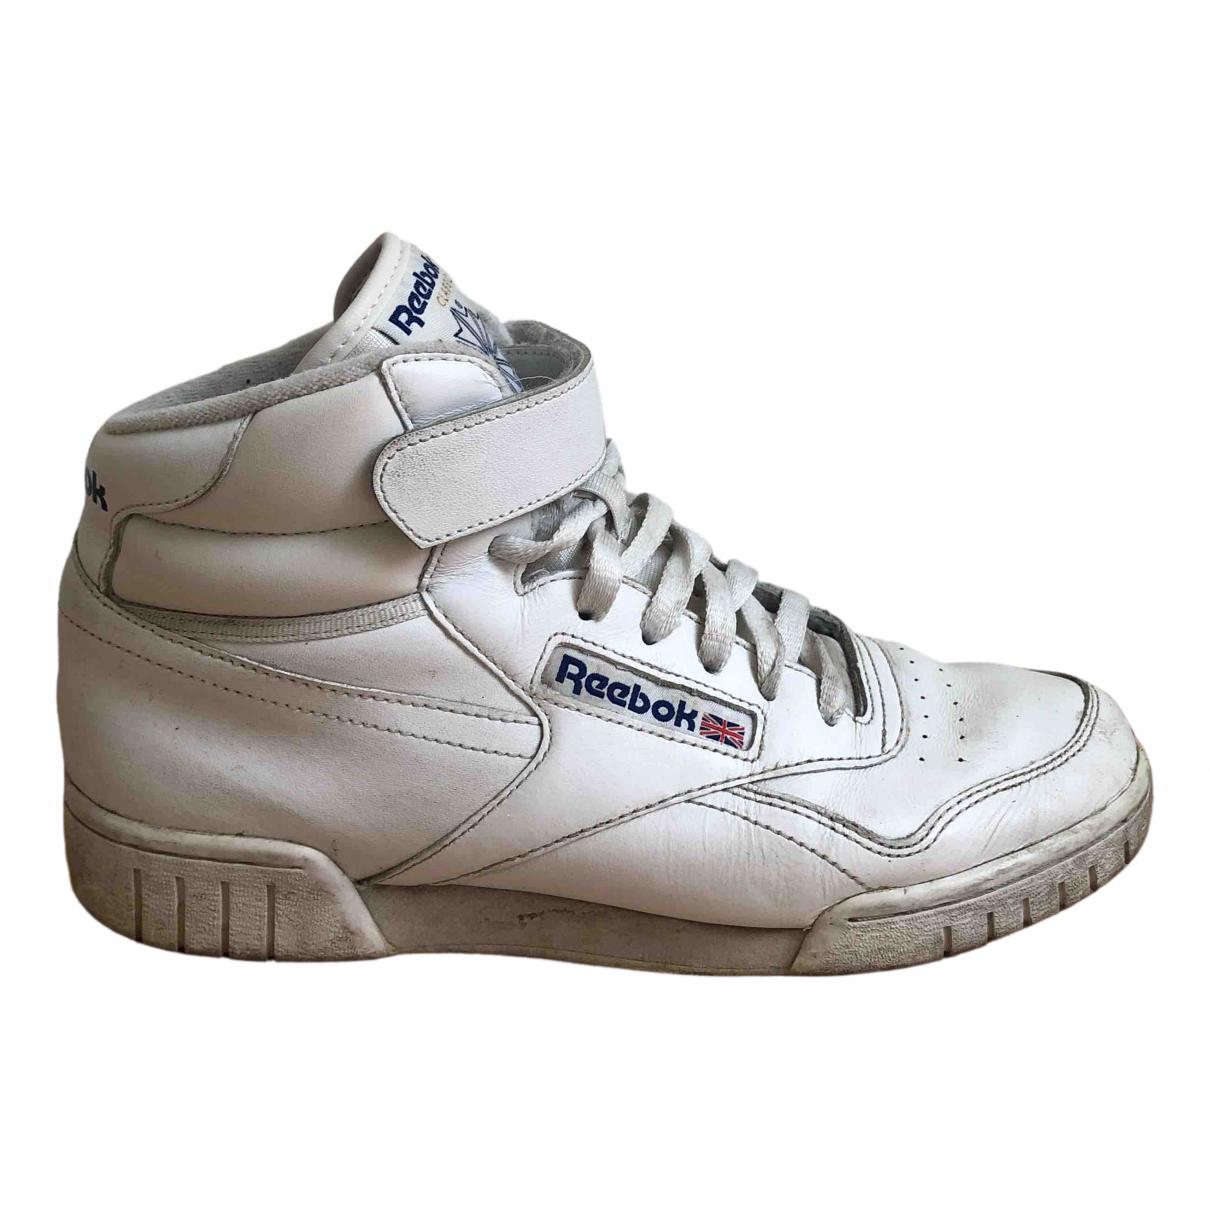 Reebok \N White Leather Trainers for Women 40 EU